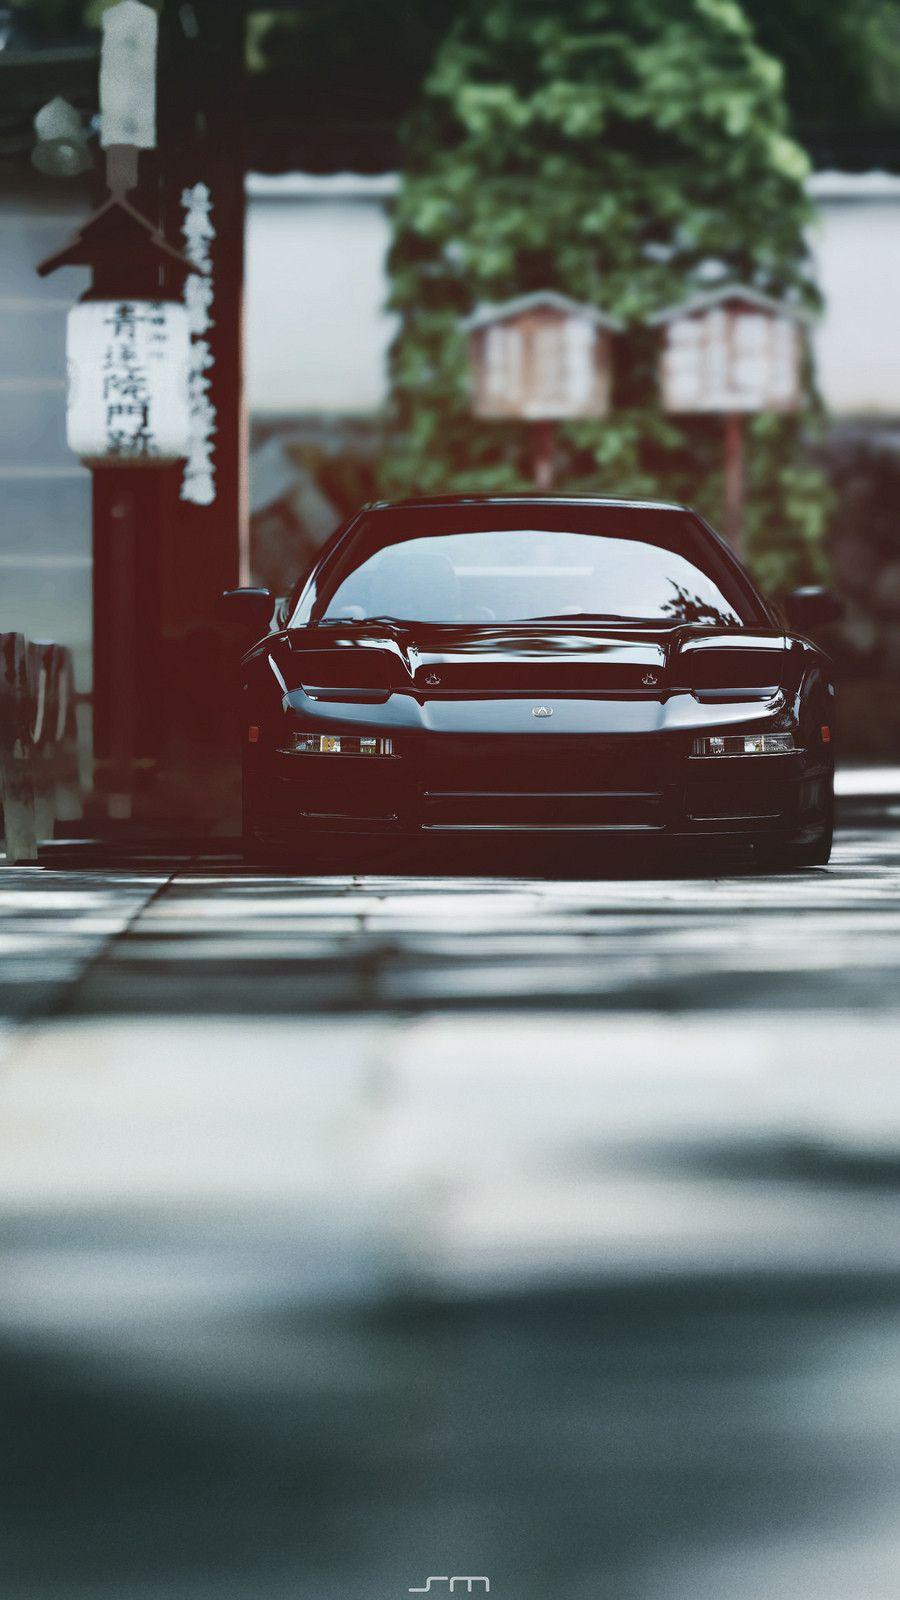 Black Cars 車の壁紙 自動車 エキゾチックカー